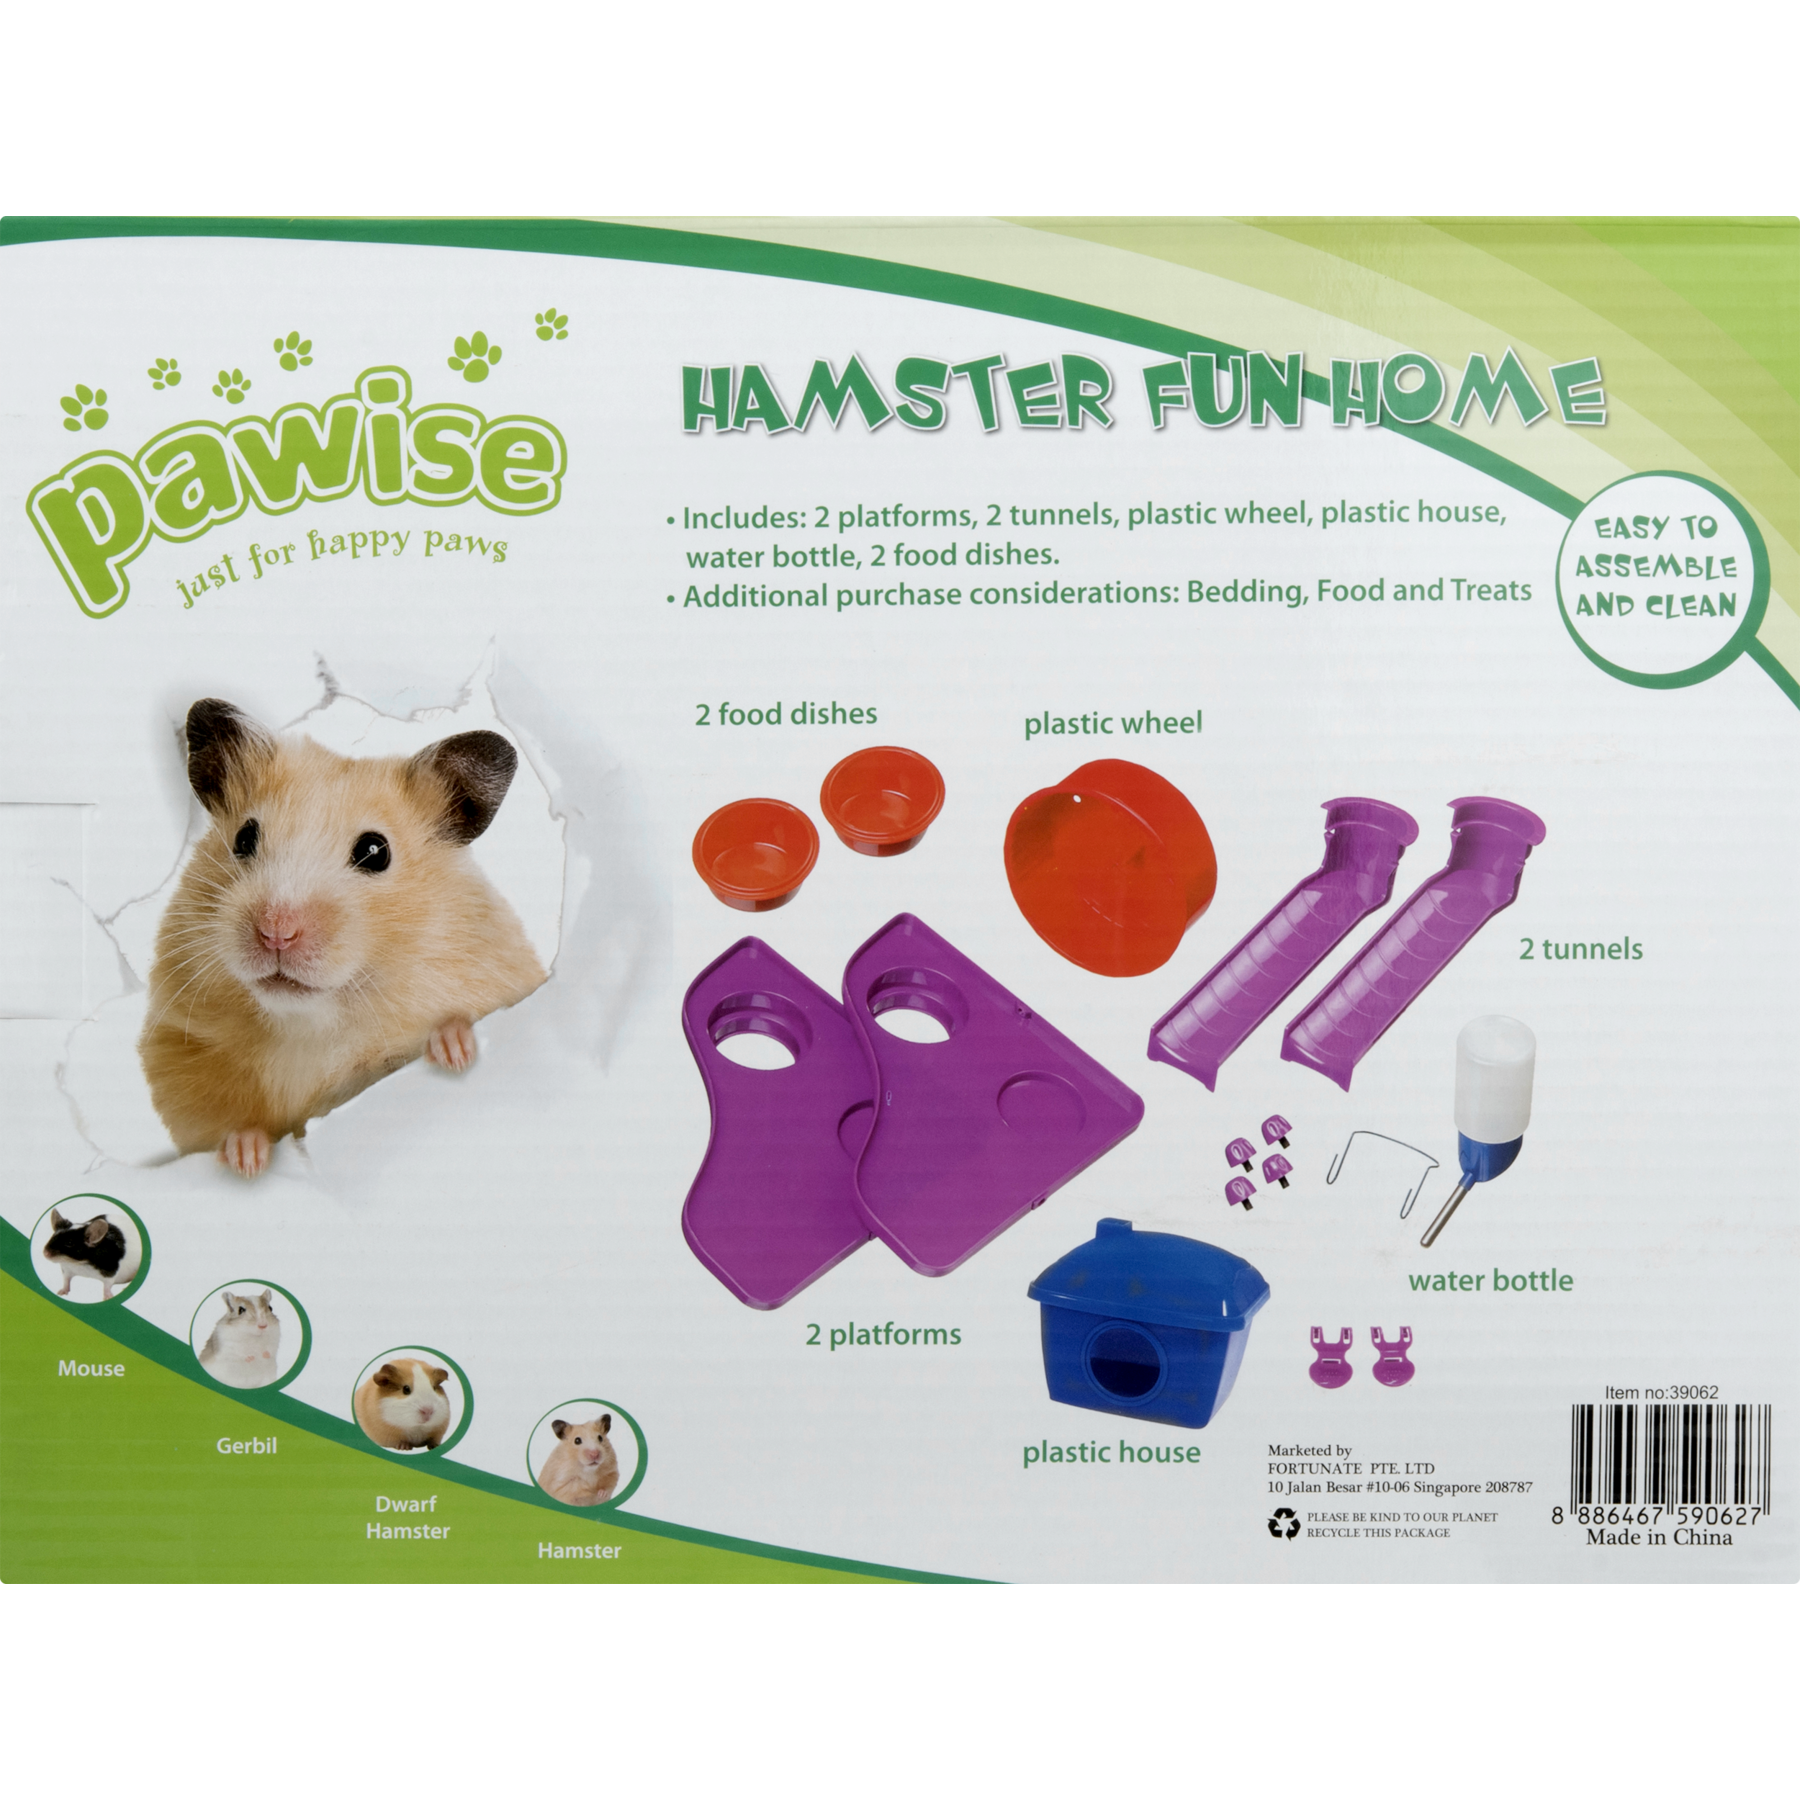 Hamster Fun Home Cage - Walmart com